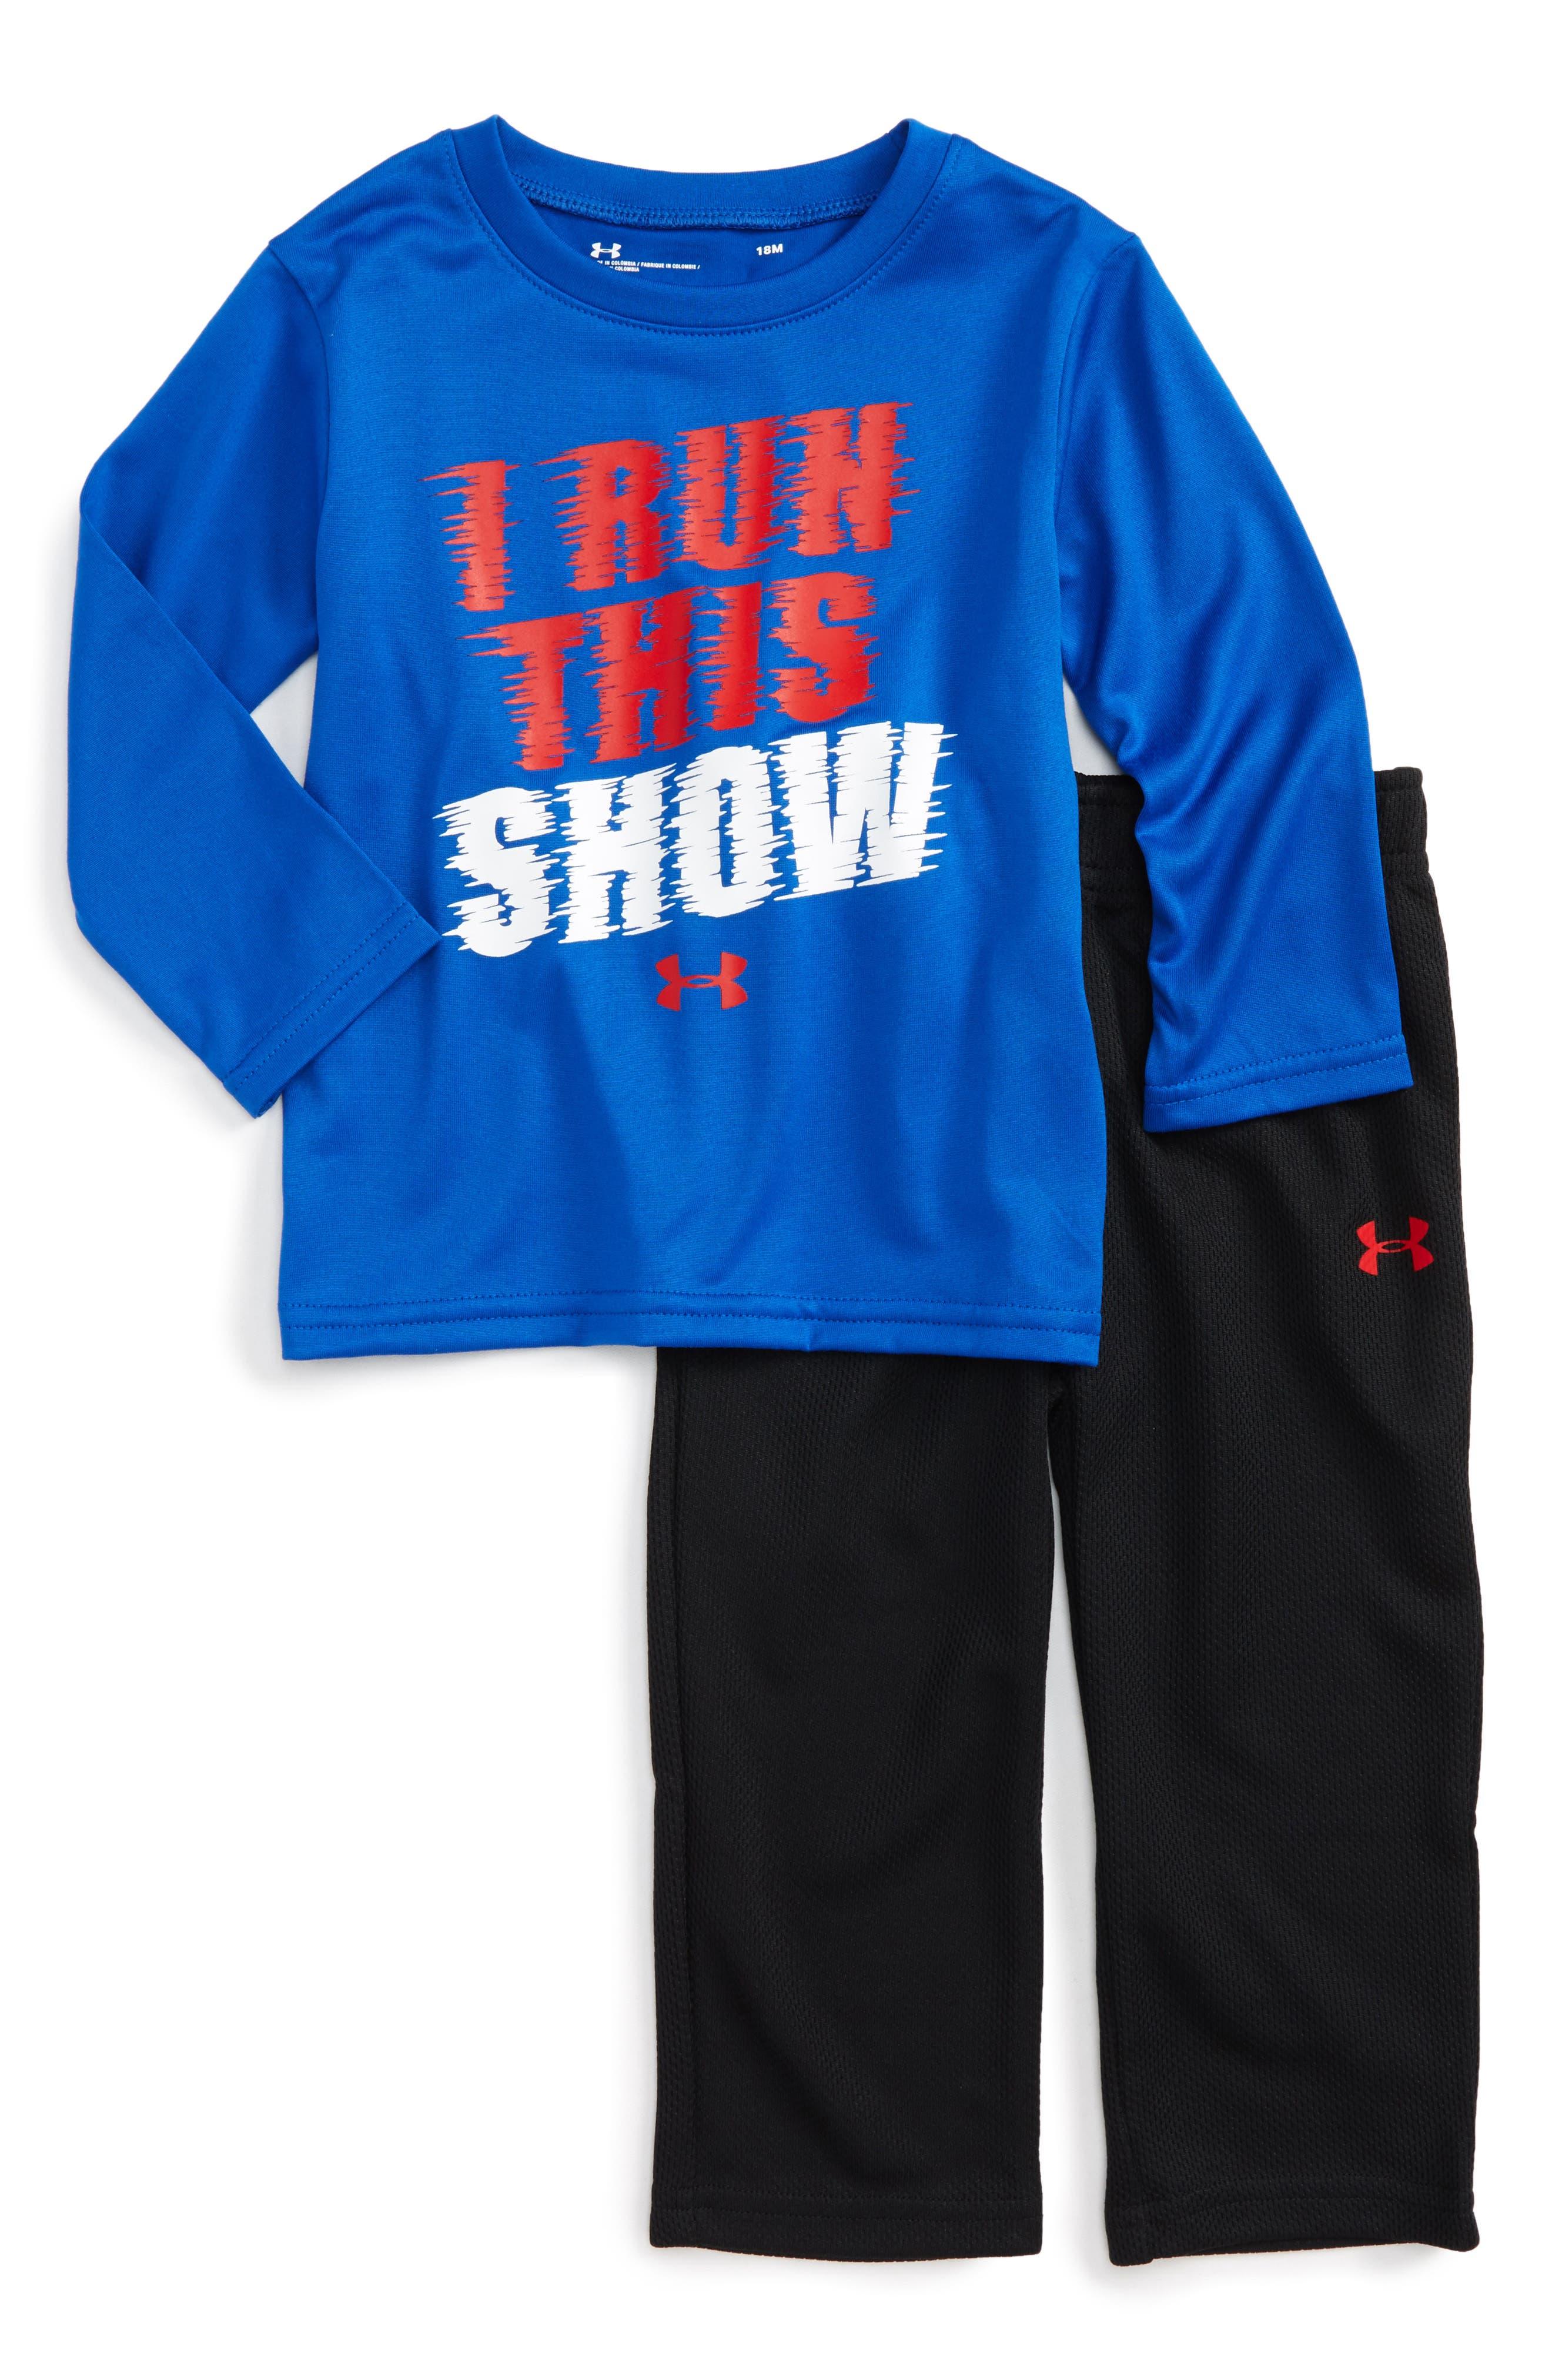 Under Armour I Run This Show T-Shirt & Pants Set (Baby Boys)